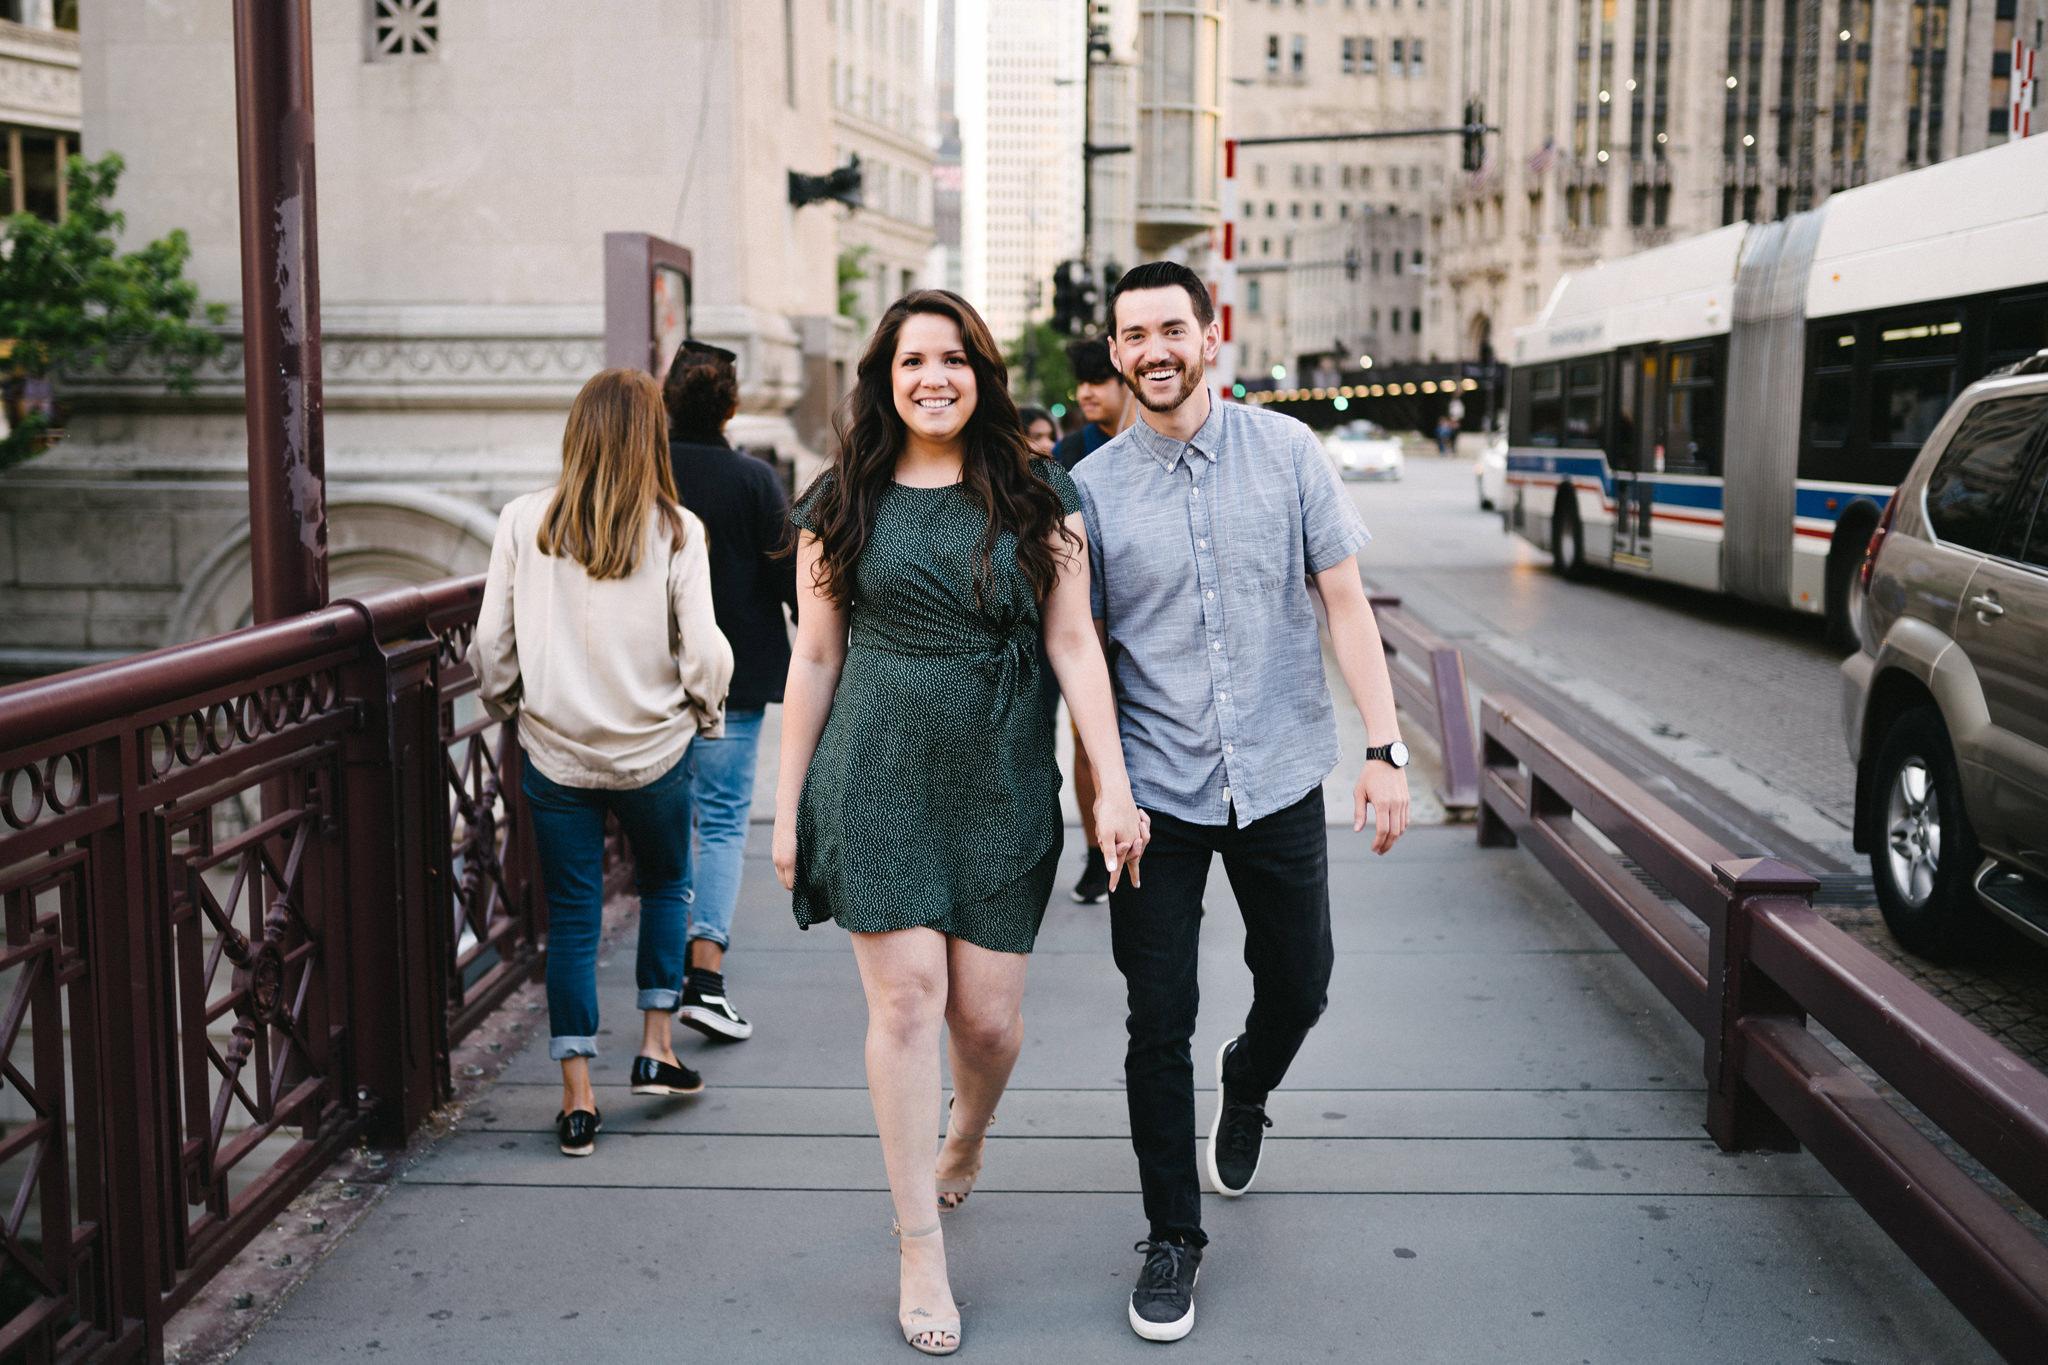 005-rempel-photography-chicago-wedding-inspiration-matt-mariana-riverwalk-engagement-session-city-view-loft-ohana-events.jpg